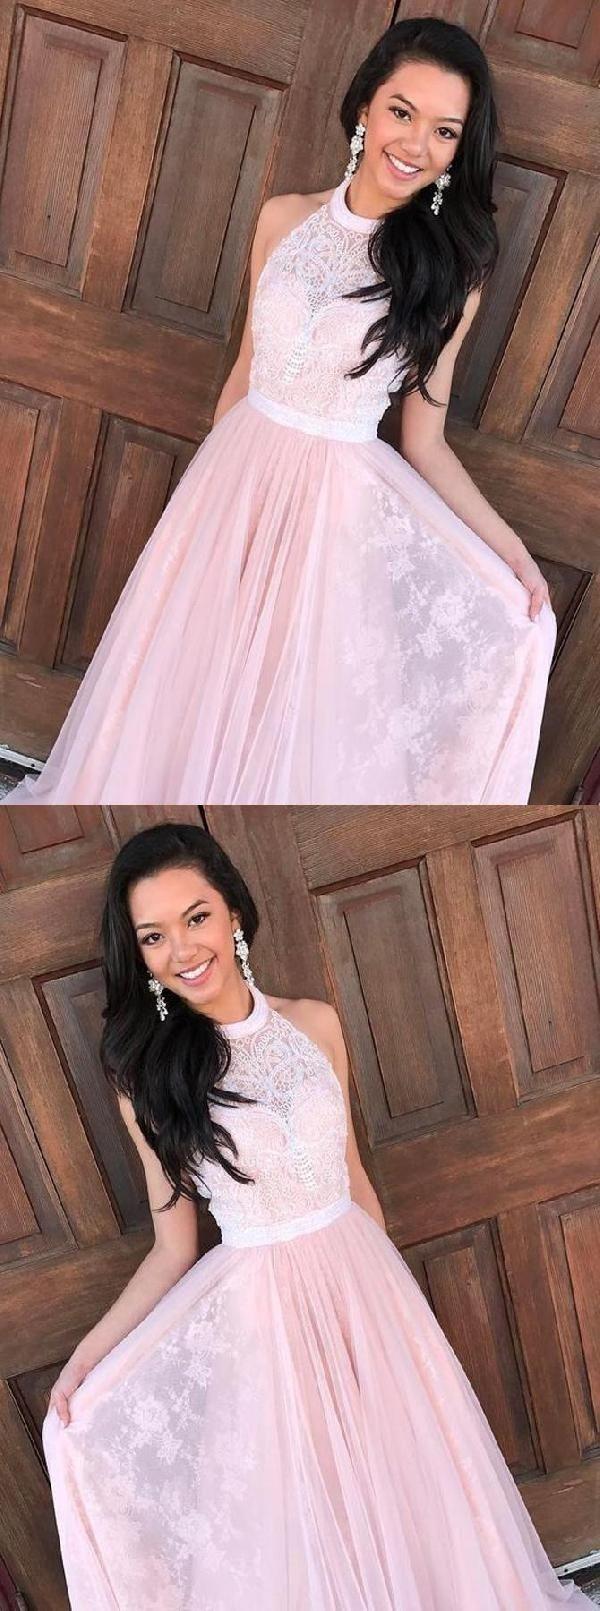 Customized vogue lace prom dresses aline prom dresses prom